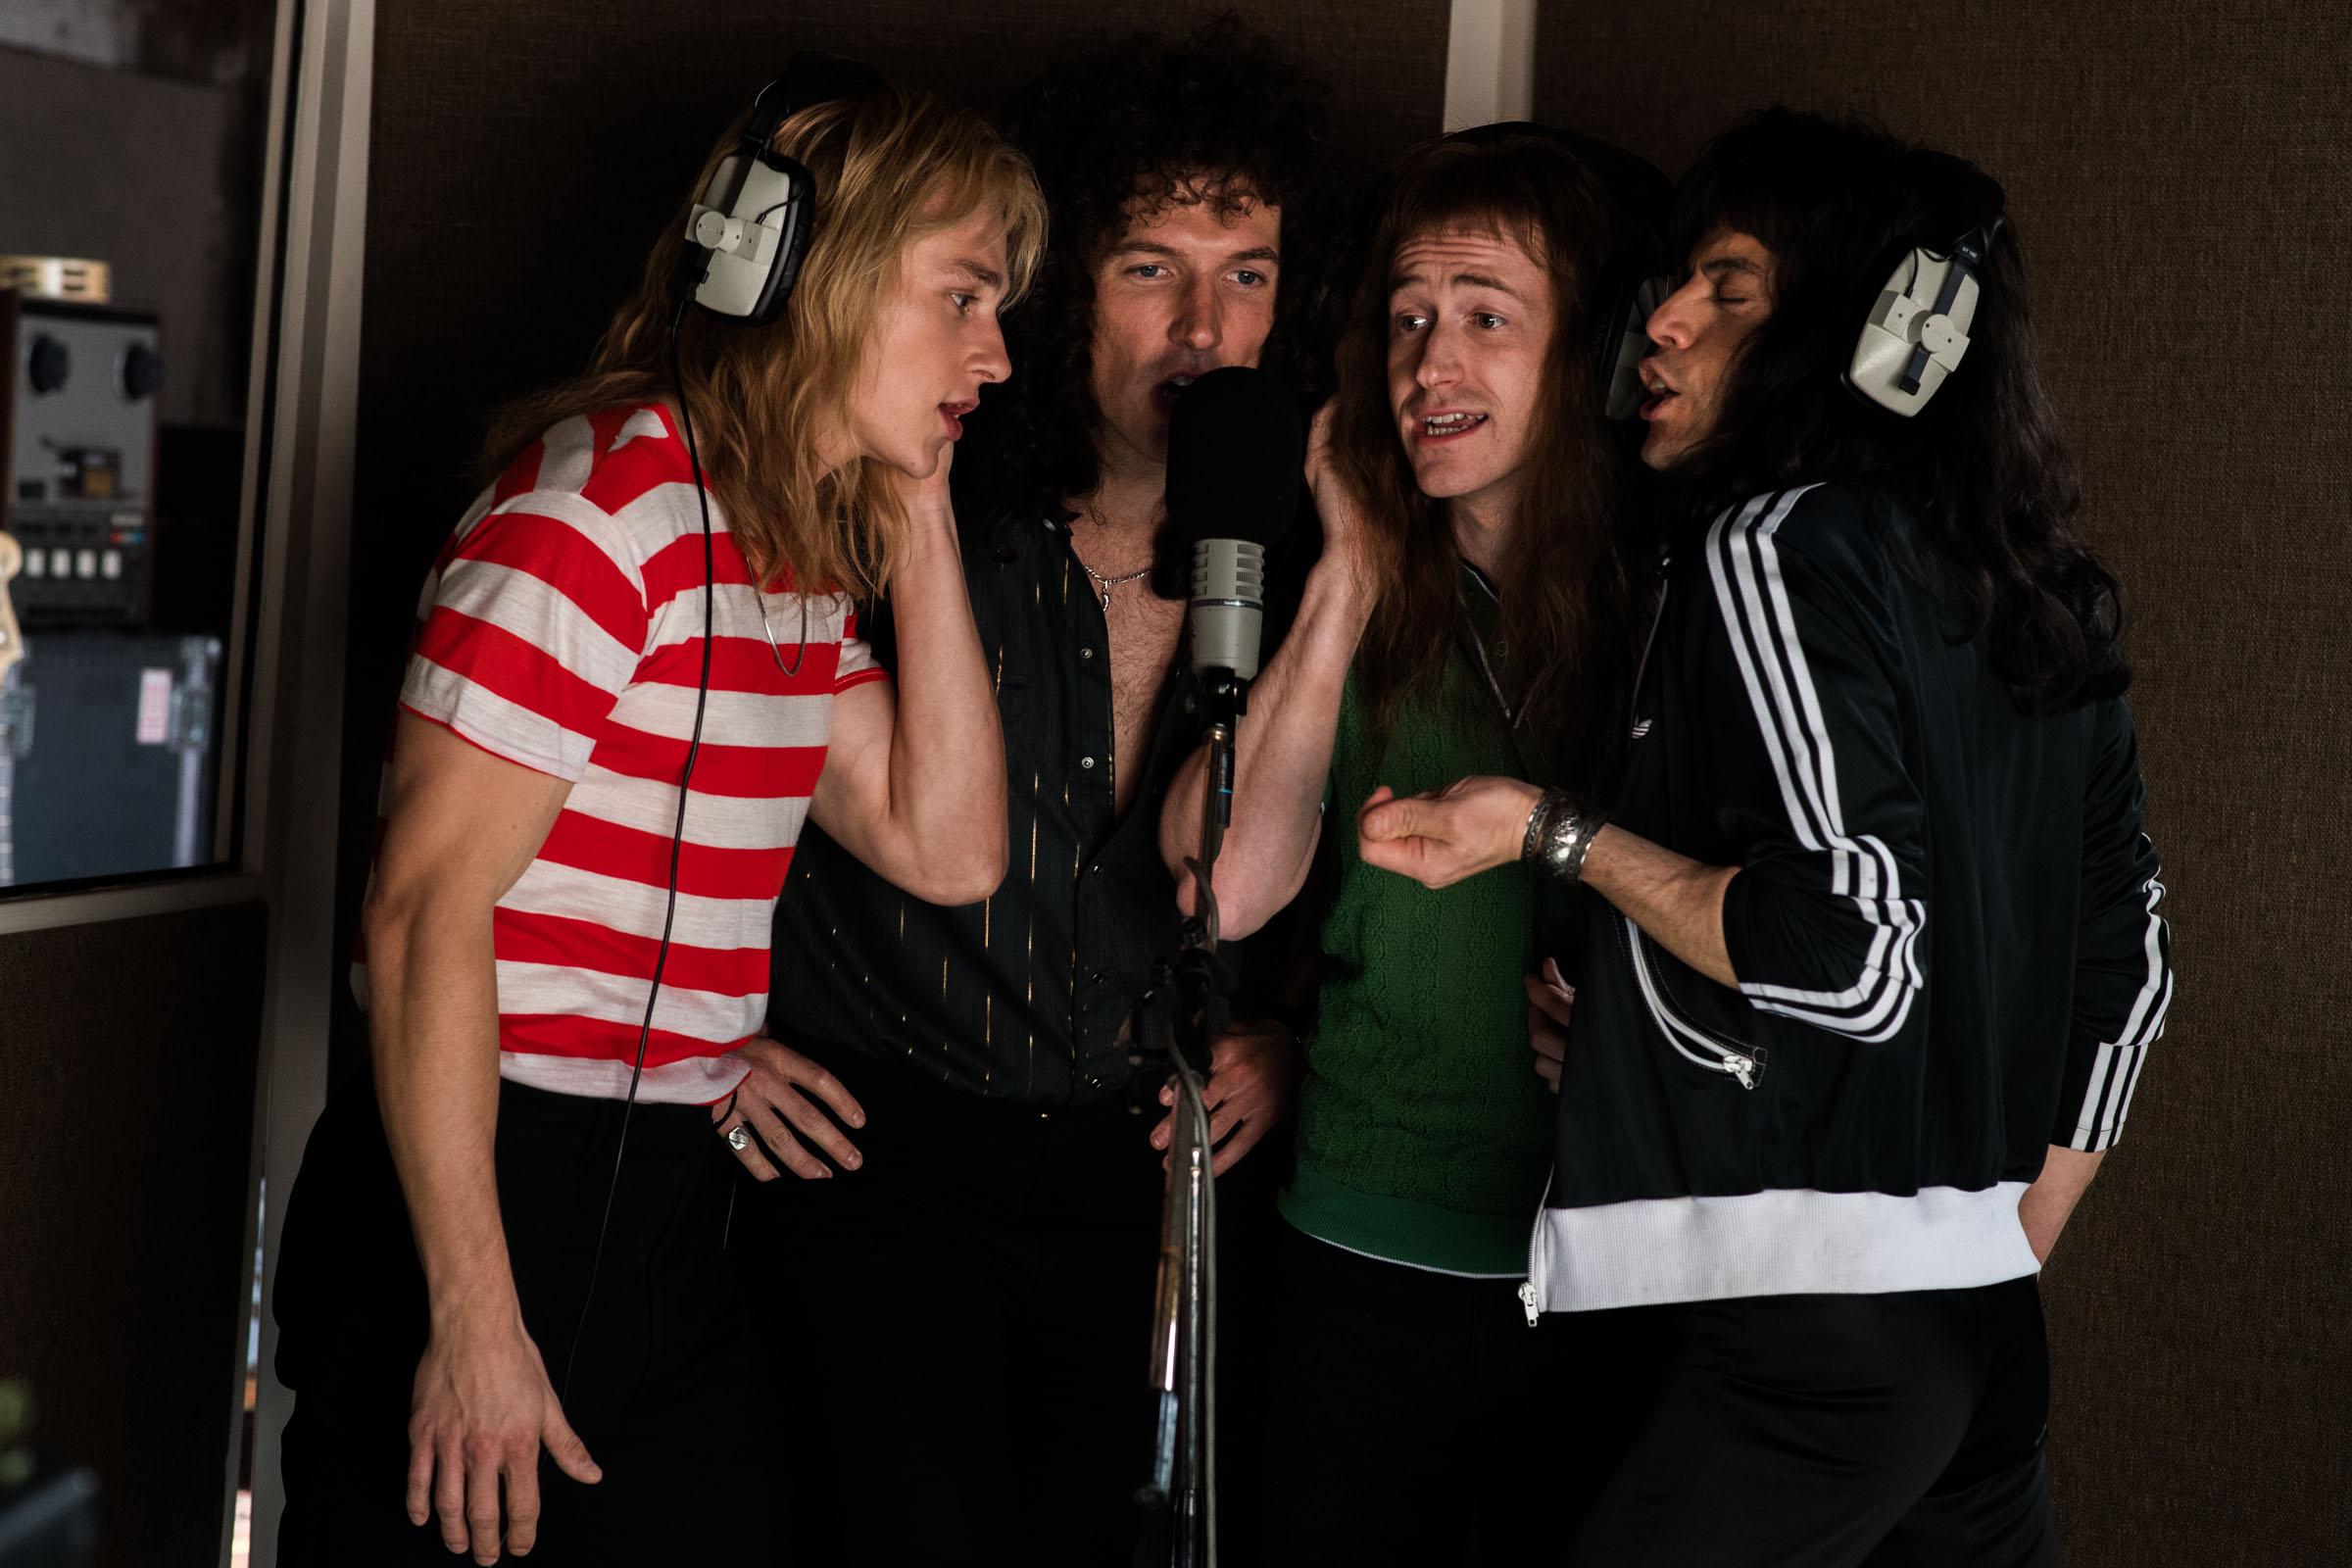 Queen band (actors) ben hardy, gwilym lee, joe mazzello, rami malek BOHEMIAN RHAPSODY